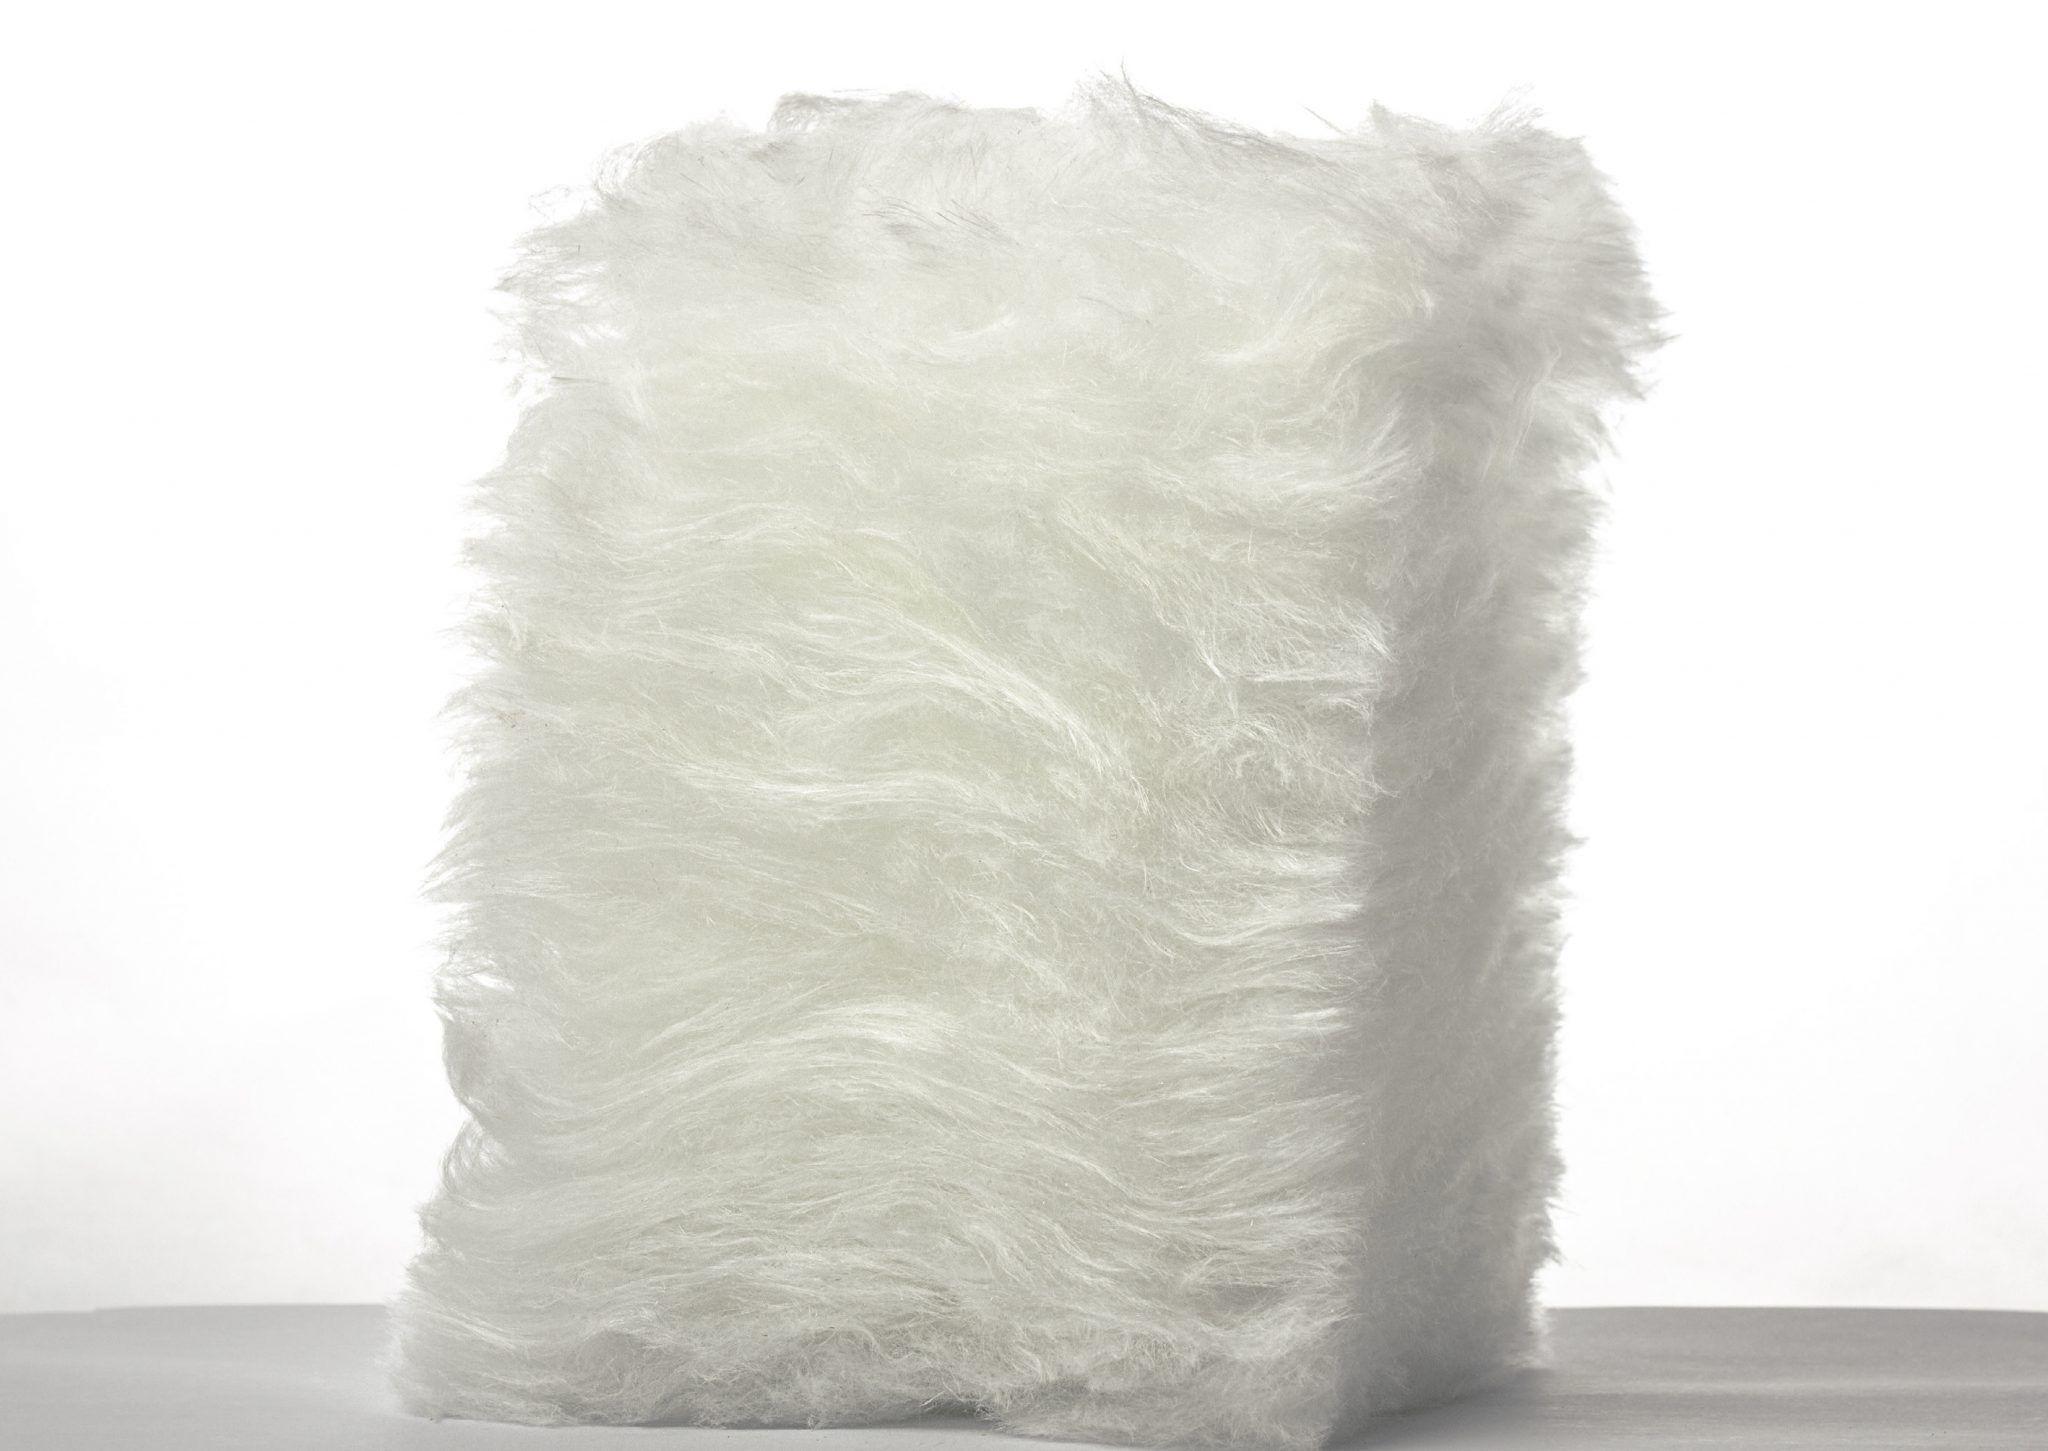 lana mineral, Lana Mineral